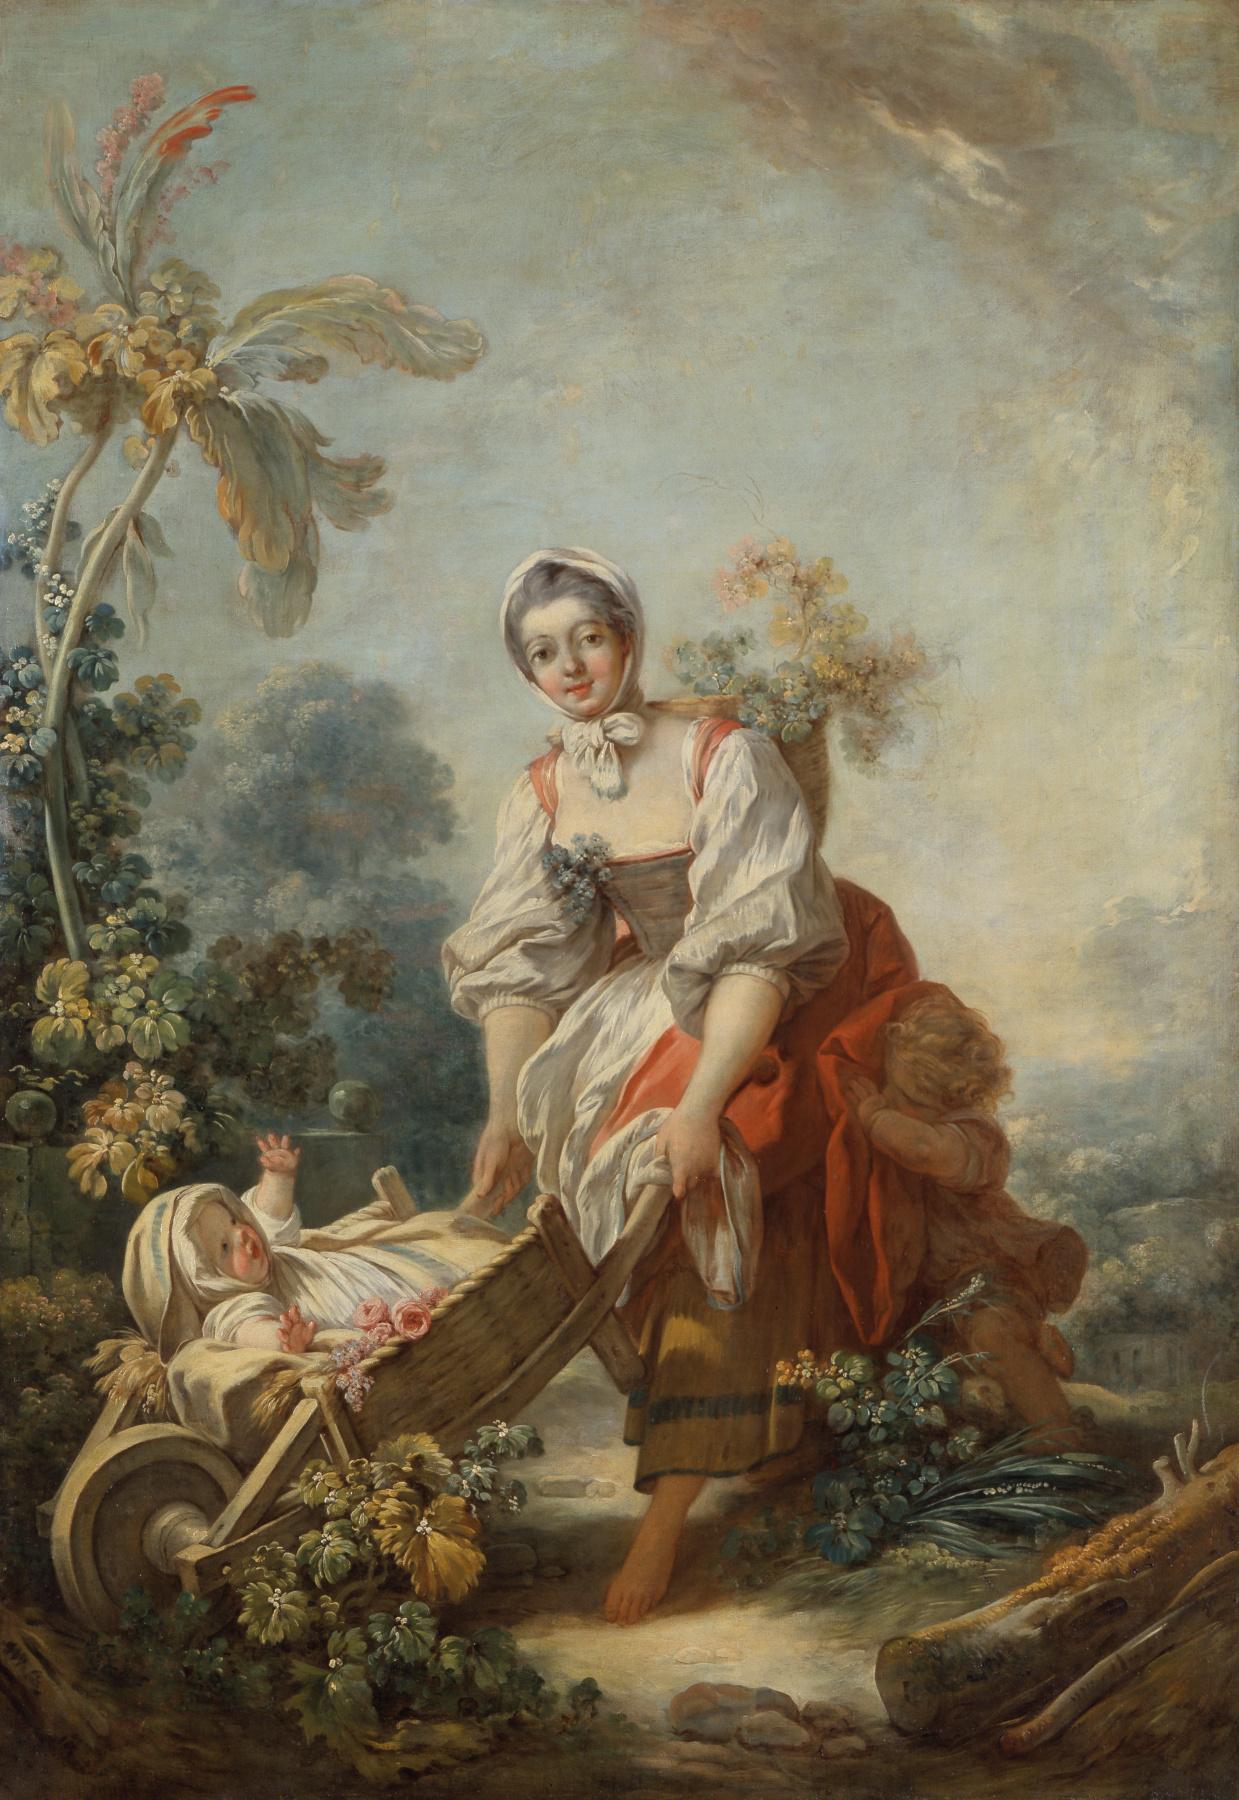 Jean-Honore Fragonard. The joy of motherhood